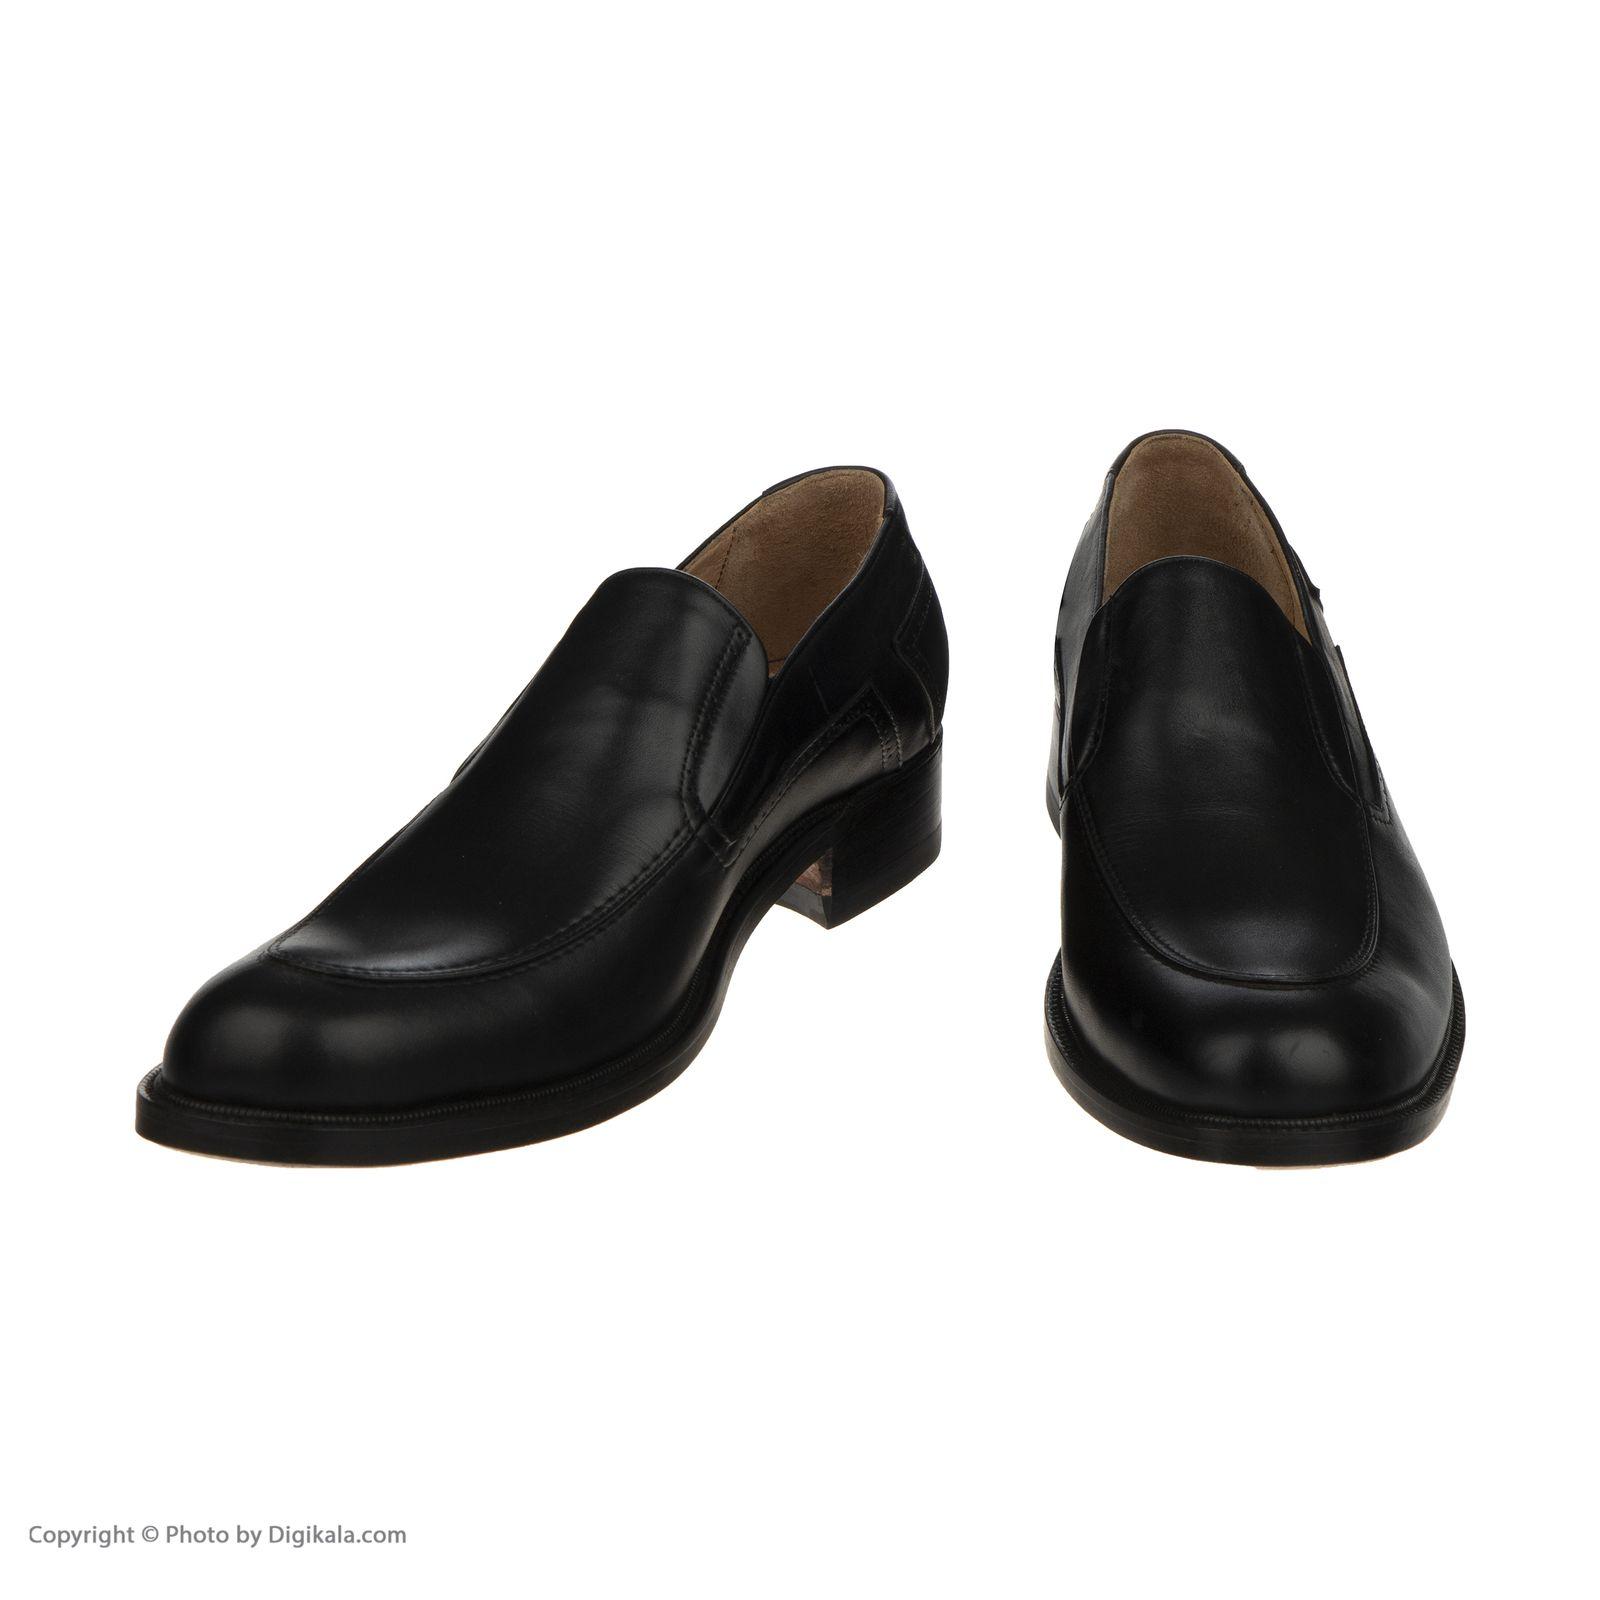 کفش مردانه نظری کد 426 -  - 4